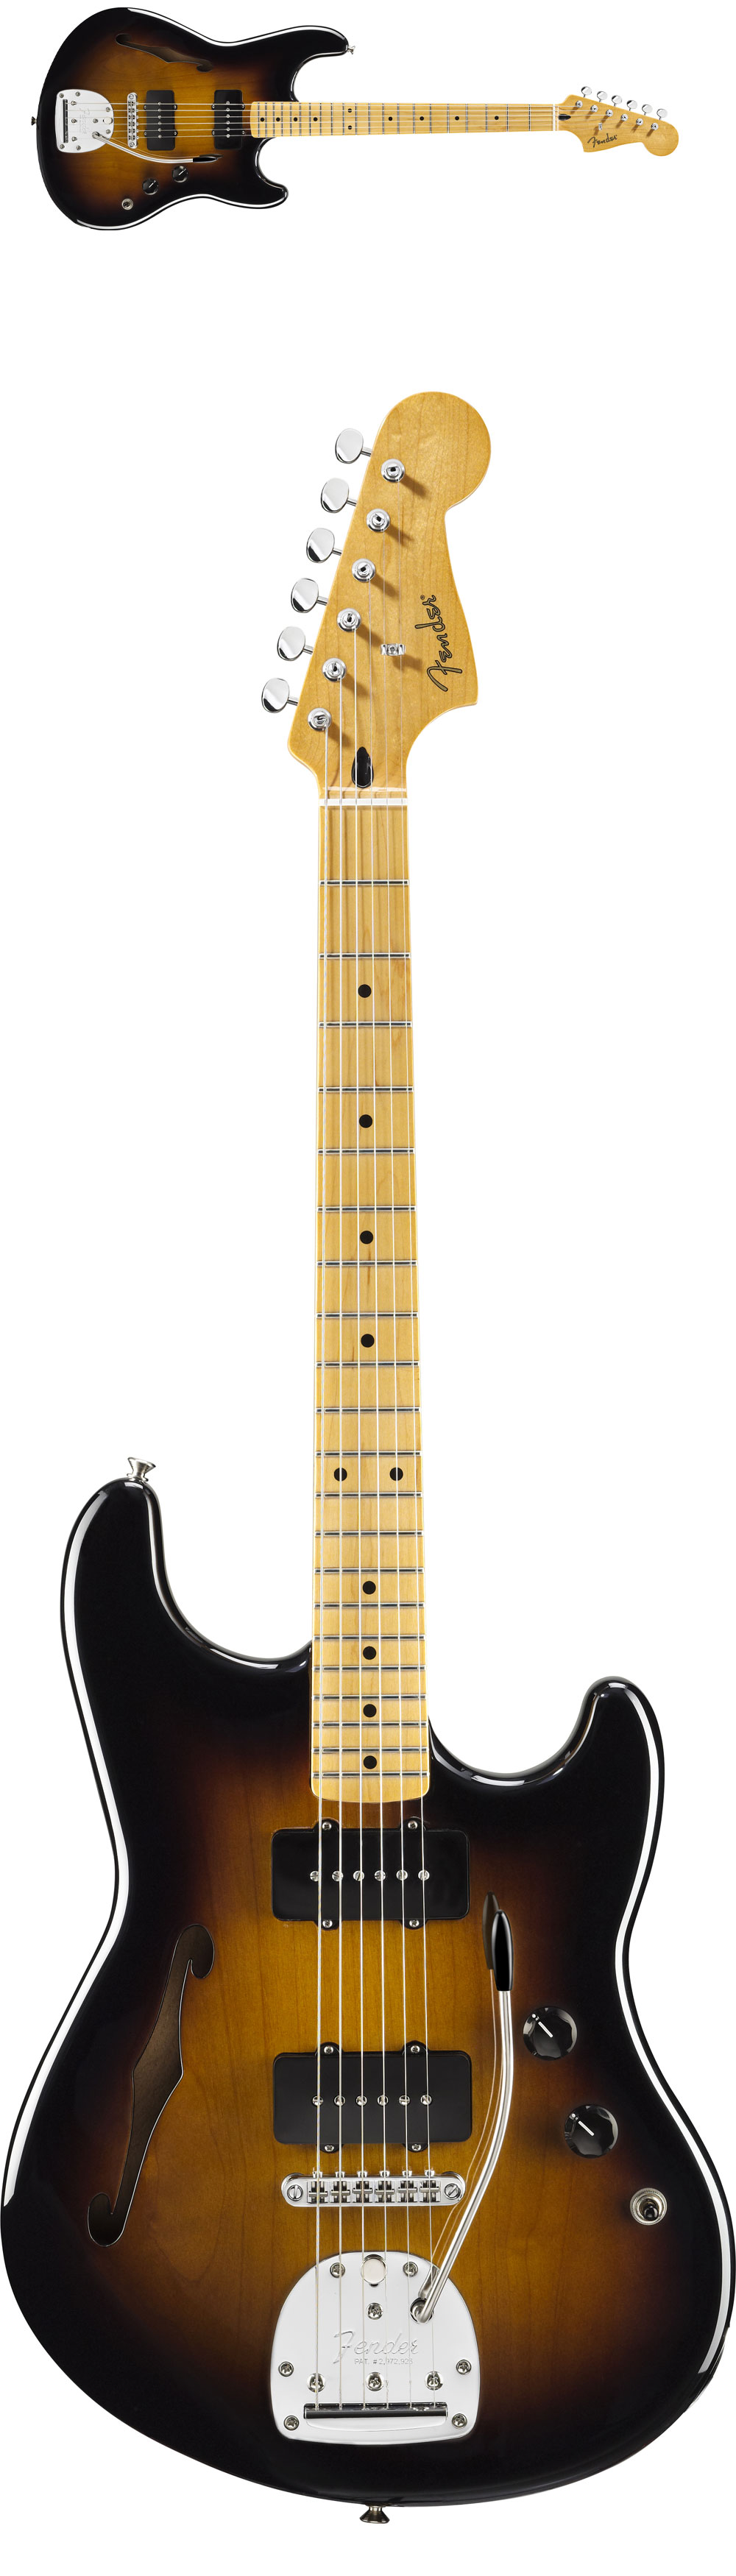 Fender Pawn Shop Offset Special Sunburst Maple